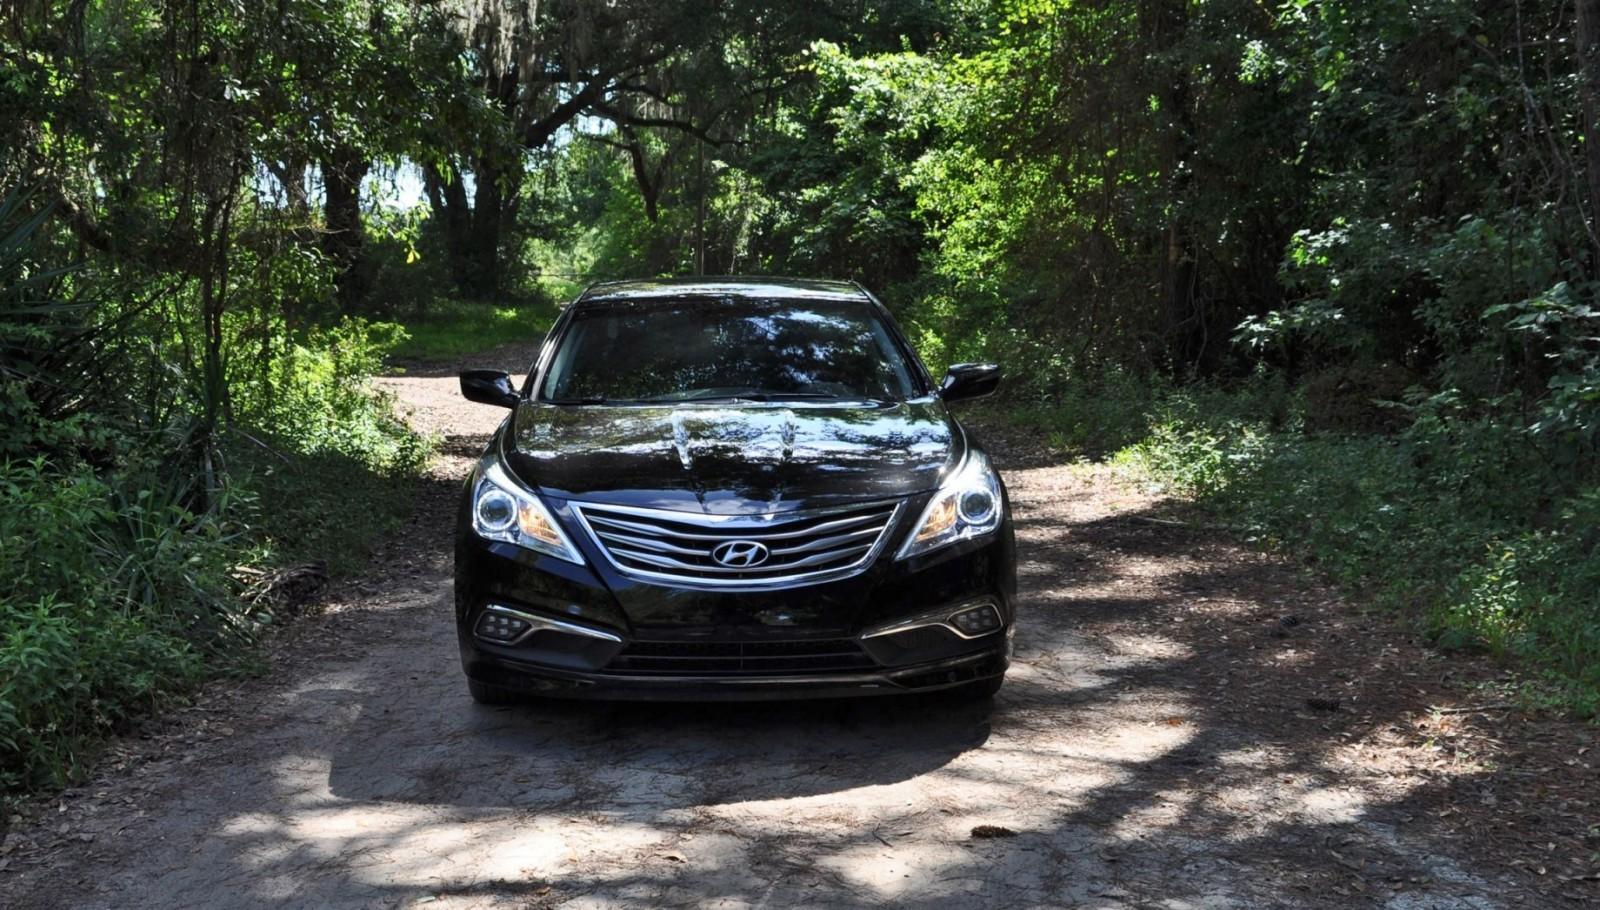 Road Test Review - 2015 Hyundai AZERA Limited 43